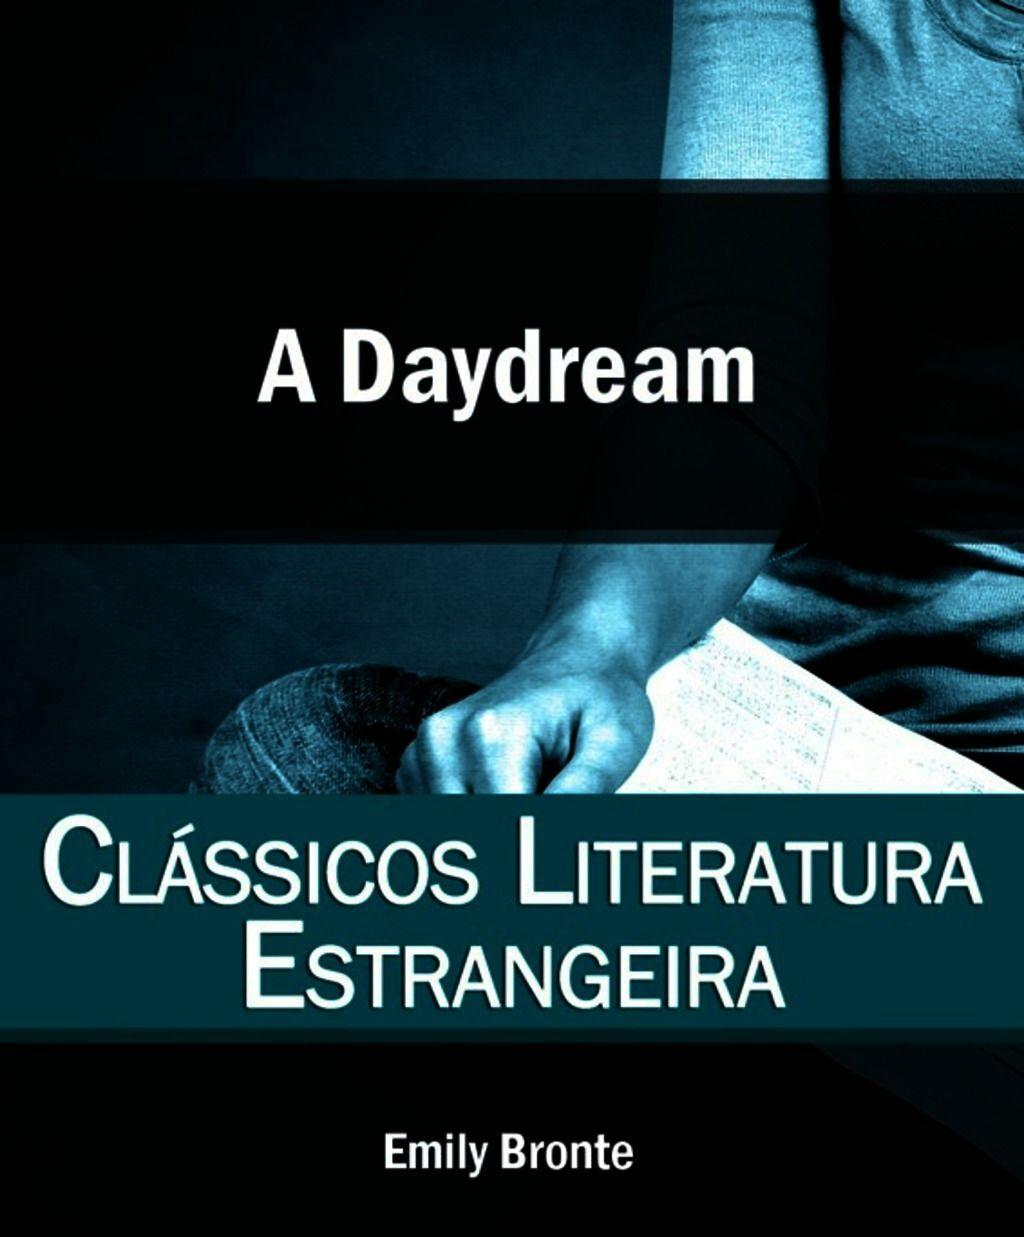 A Daydream